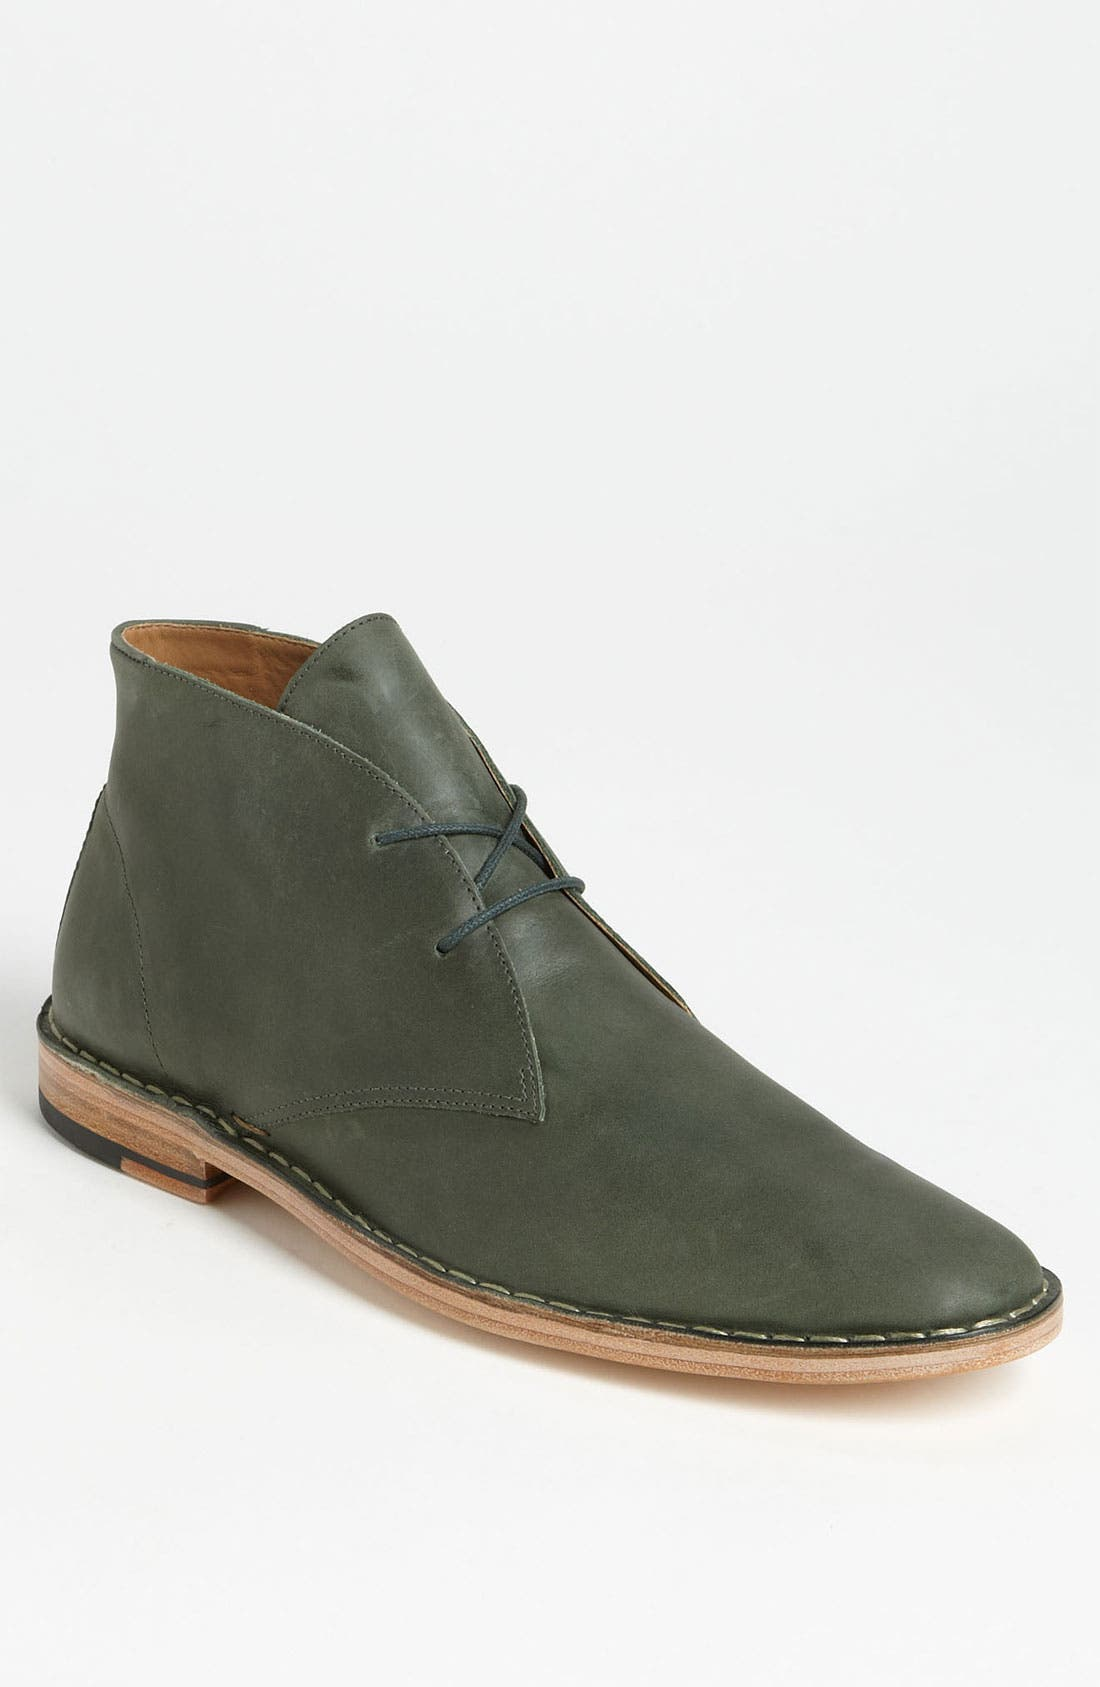 Main Image - Shipley & Halmos 'Max' Desert Boot